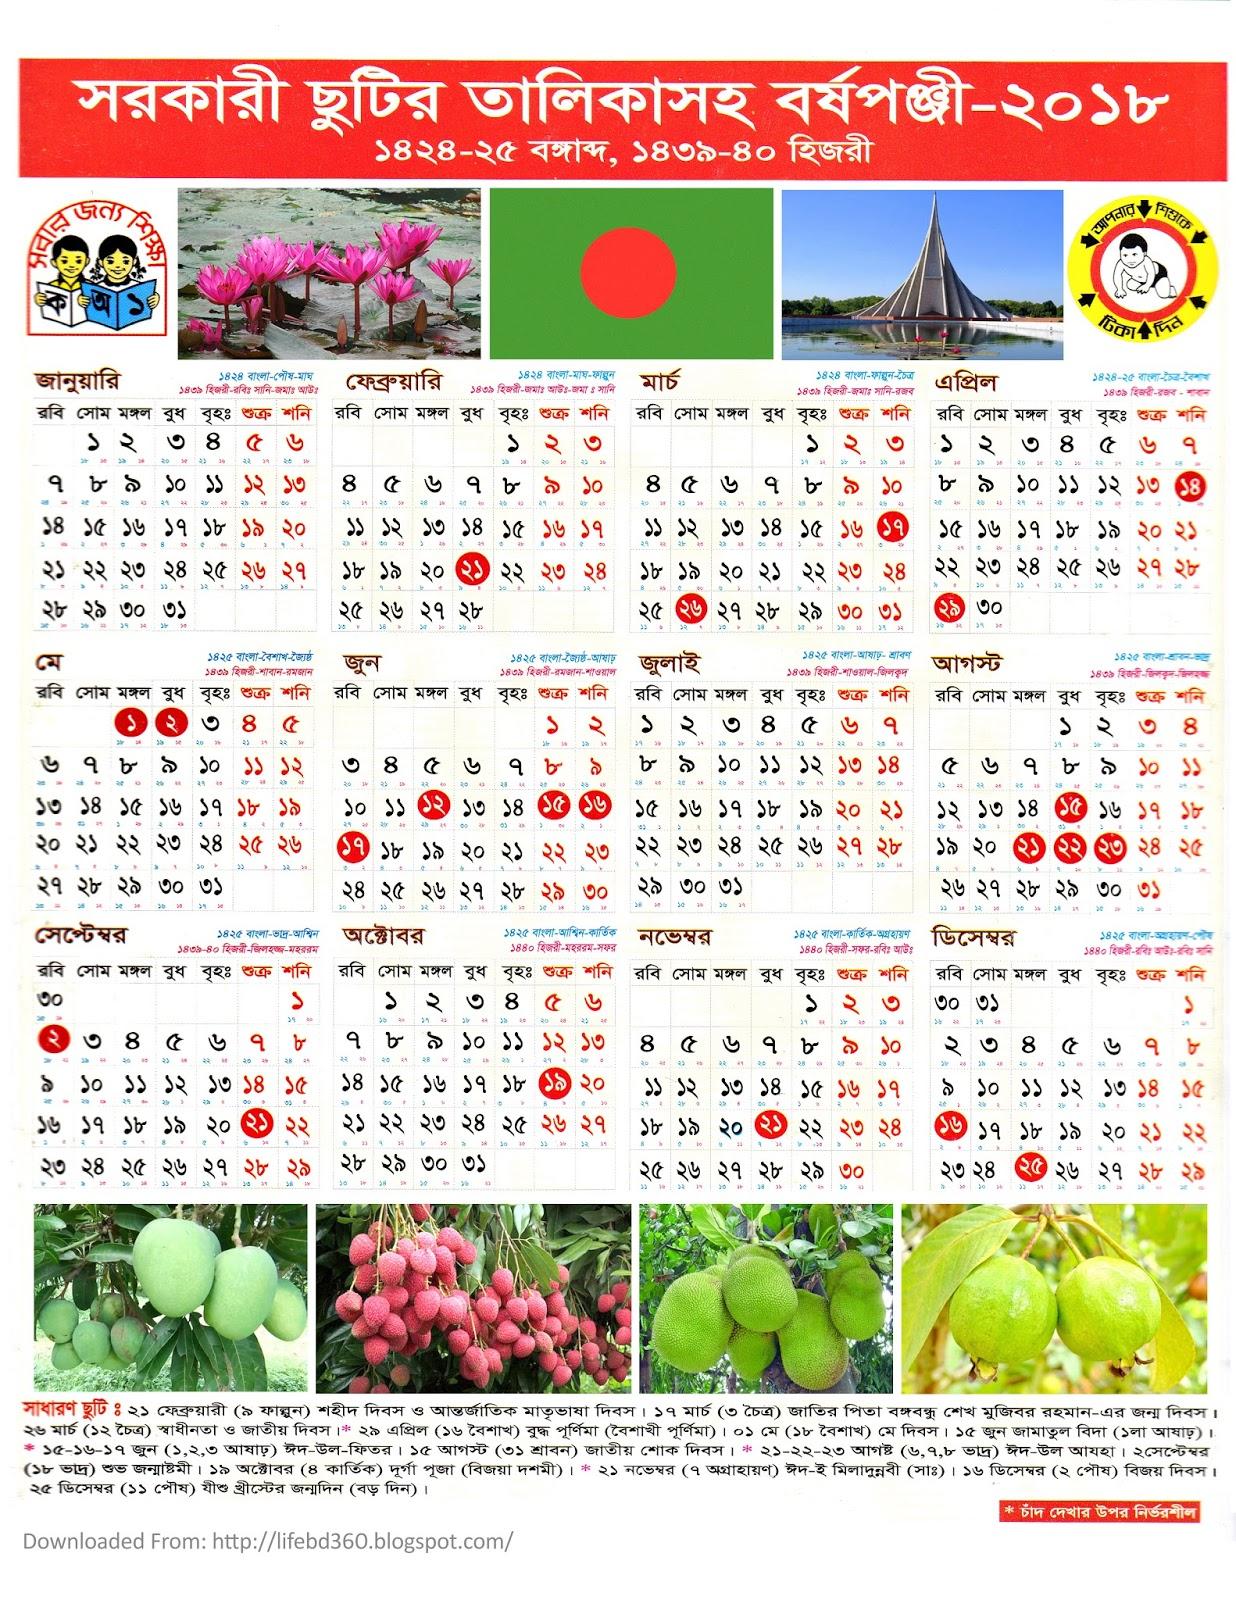 Calendar 2018 Holidays In Bangladesh